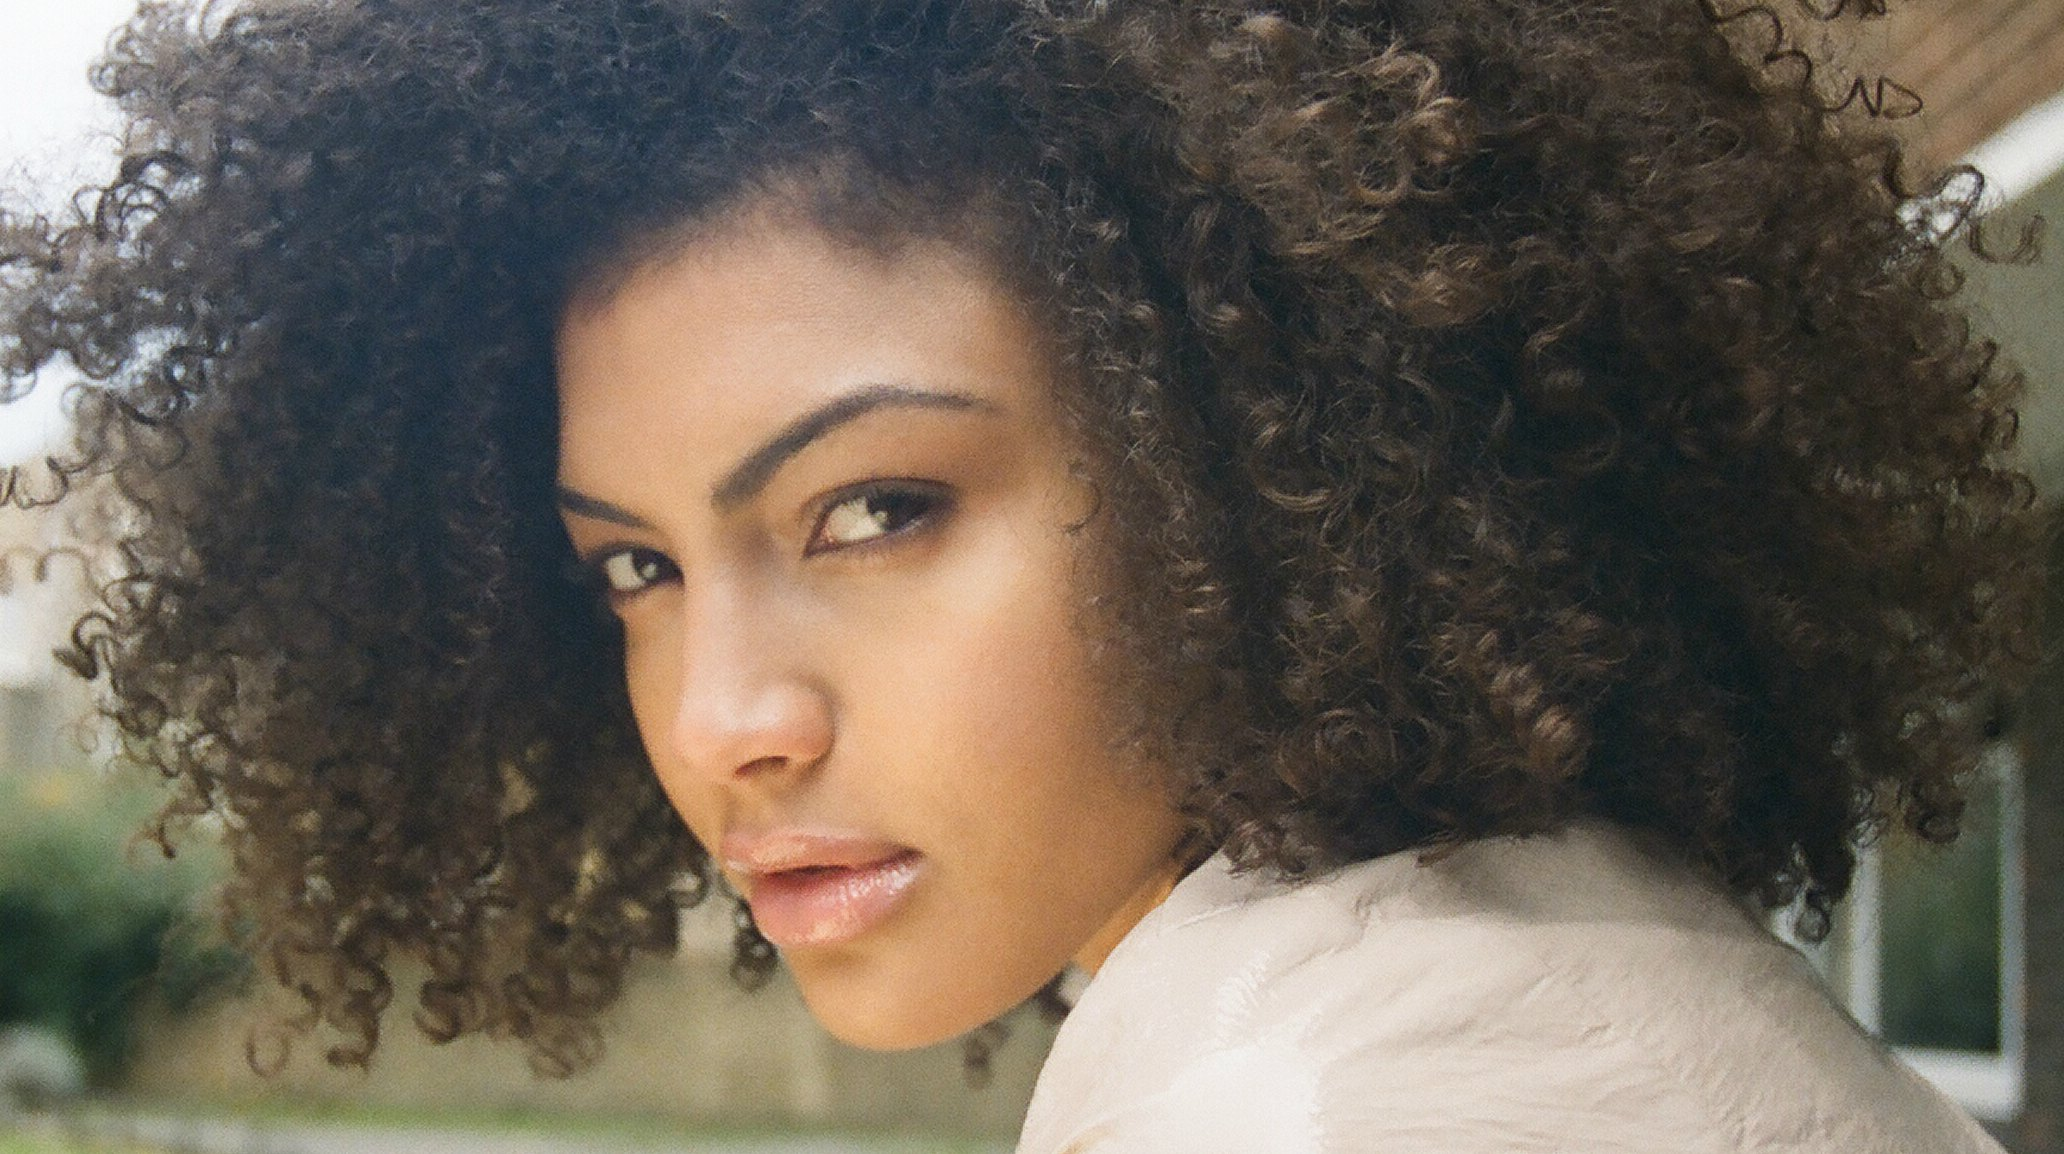 Meet our Lookfantastic Beauty Ambassadors: Part 1